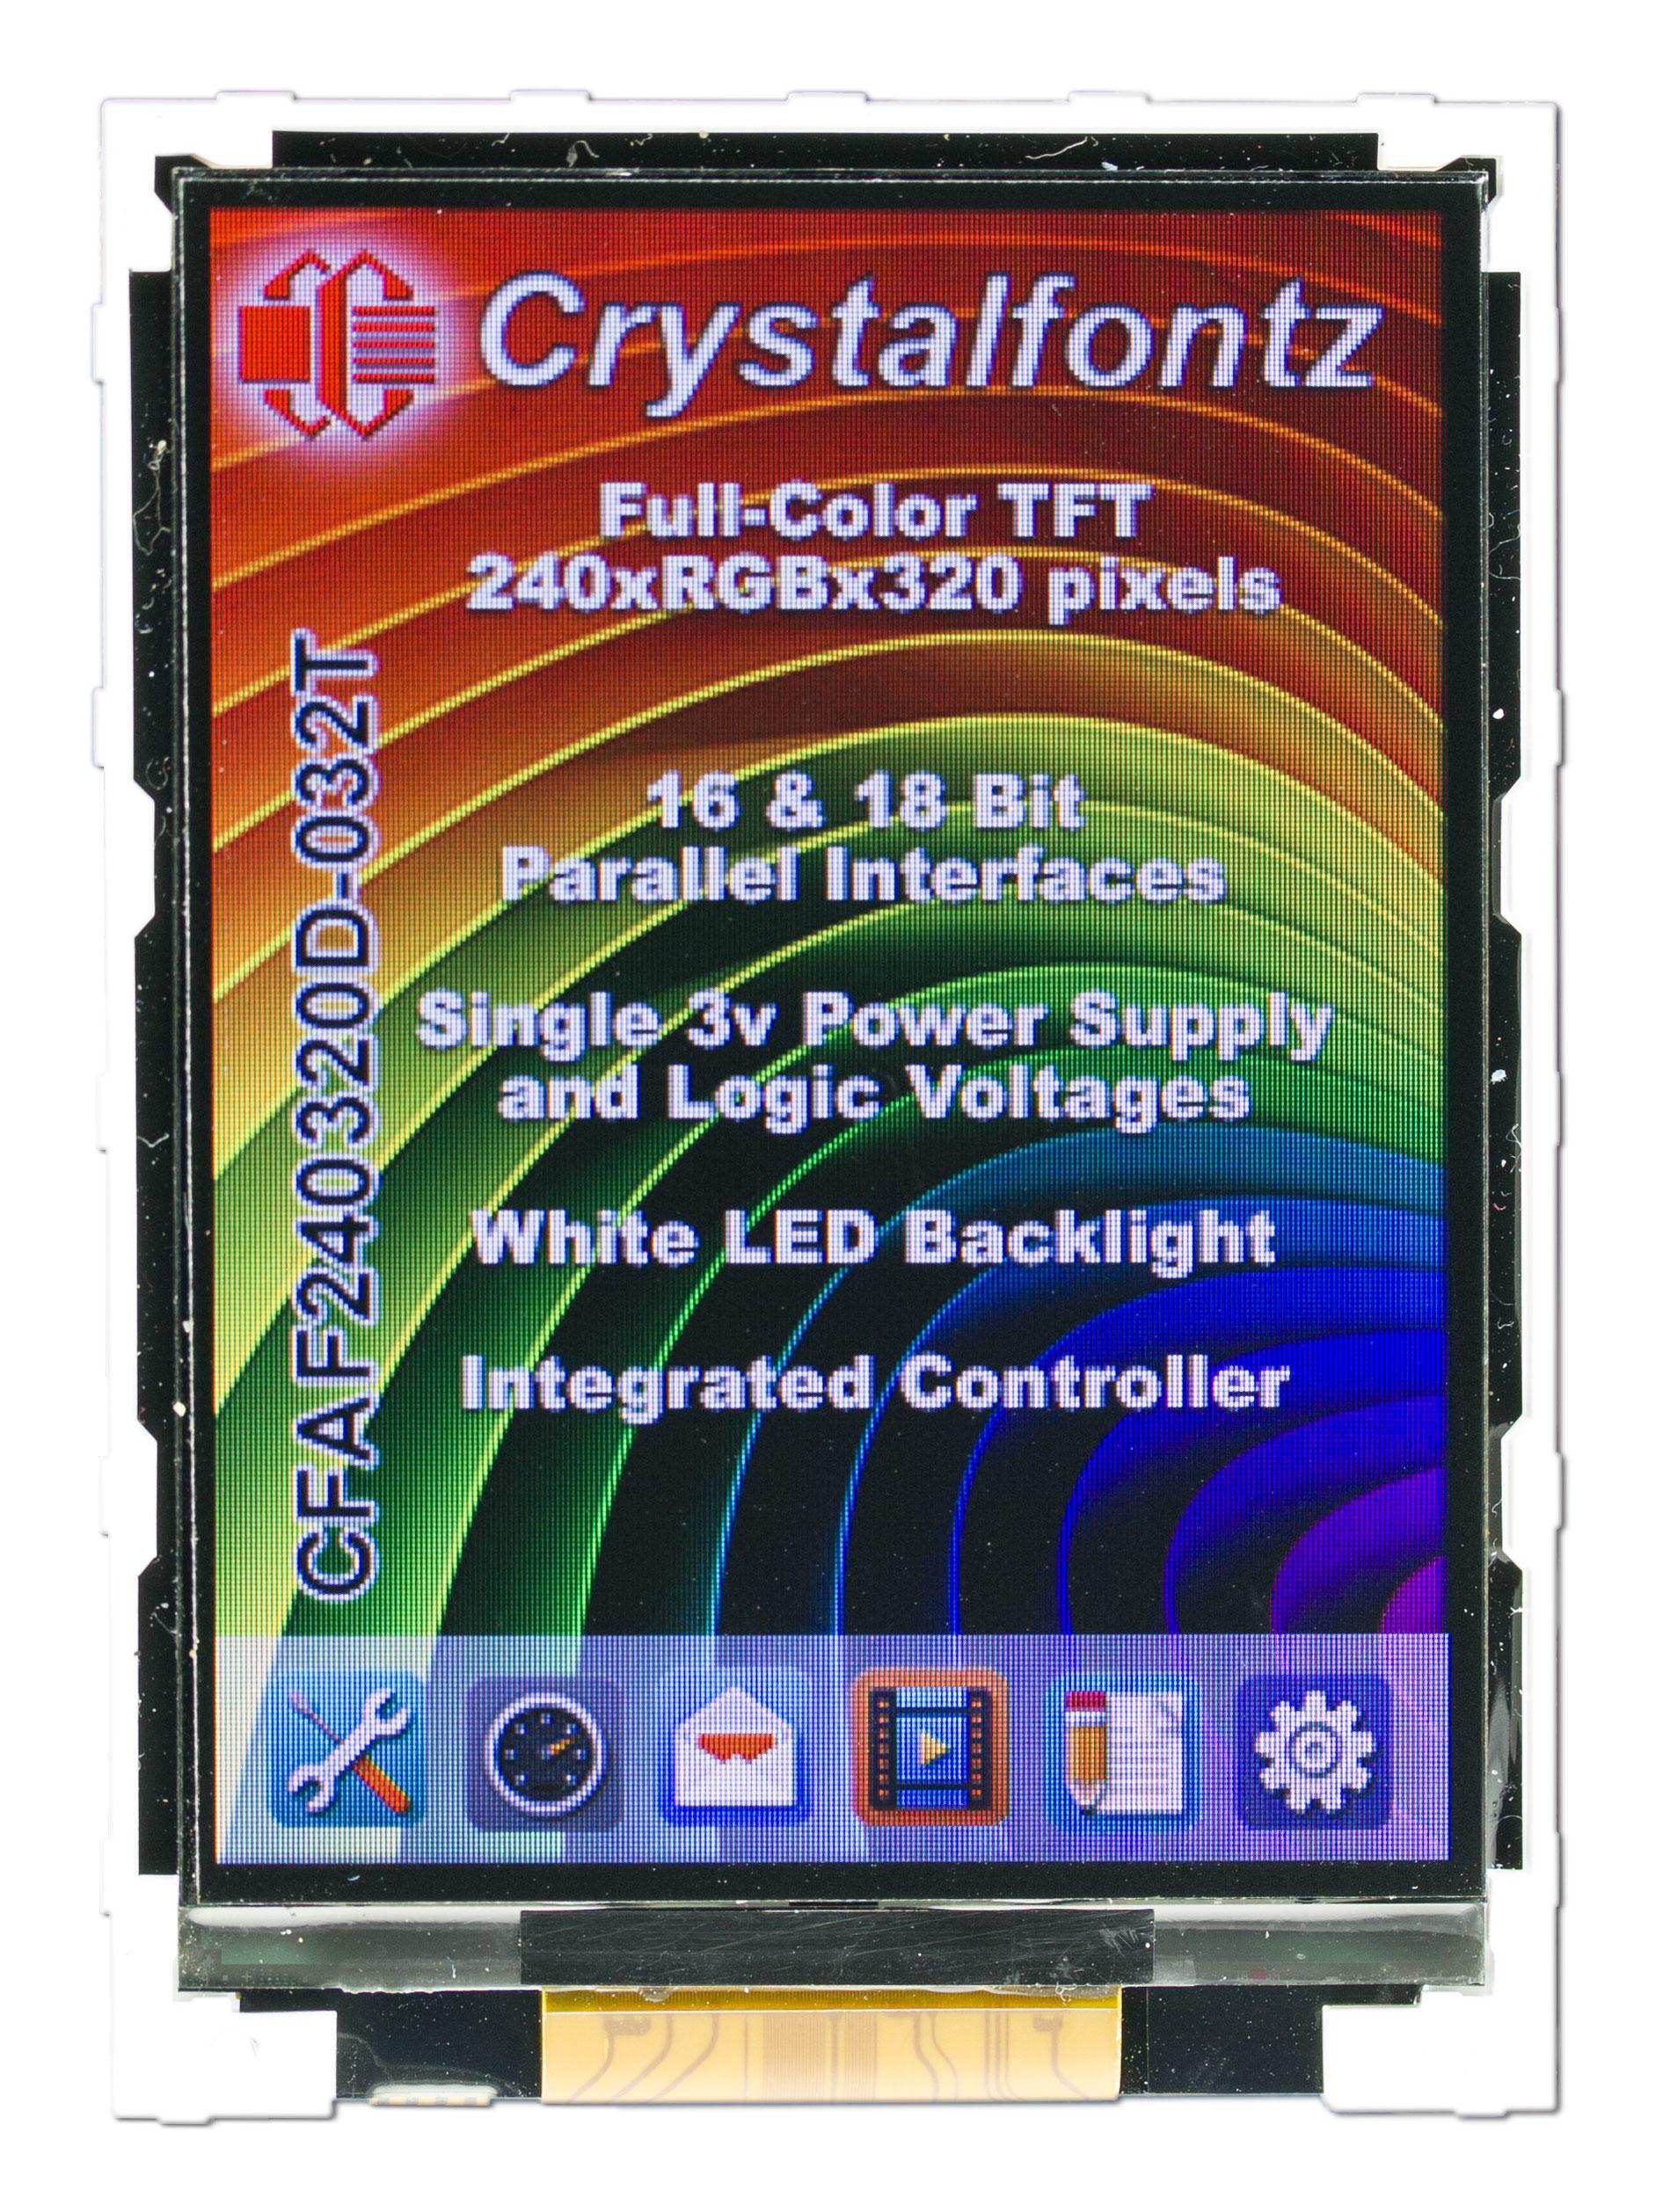 sitronix multimedia usb device software